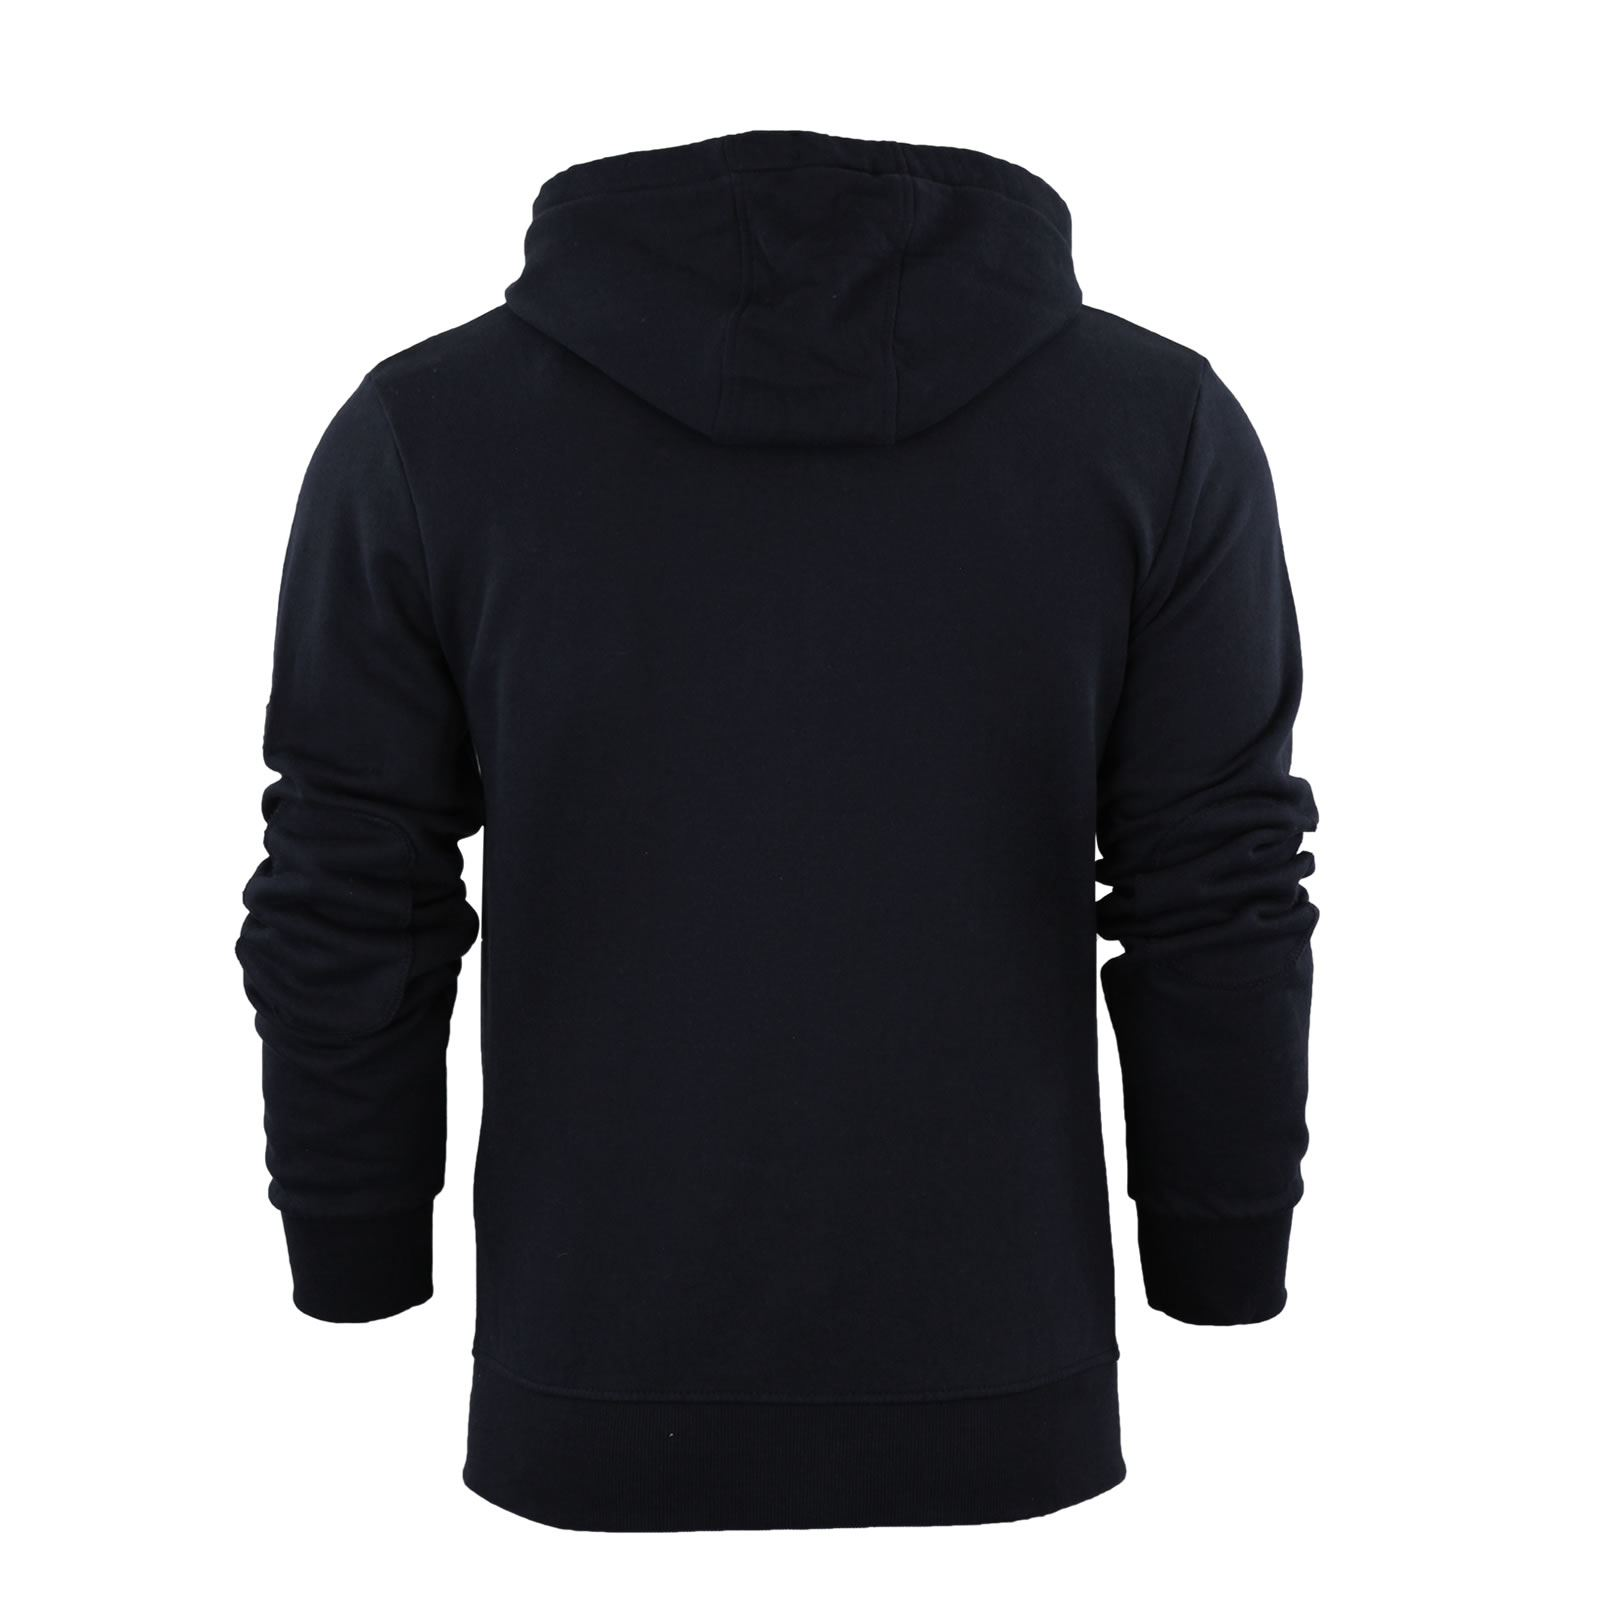 Mens-Hoodie-Smith-amp-Jones-Zip-Up-Hooded-Sweater-Jumper thumbnail 12